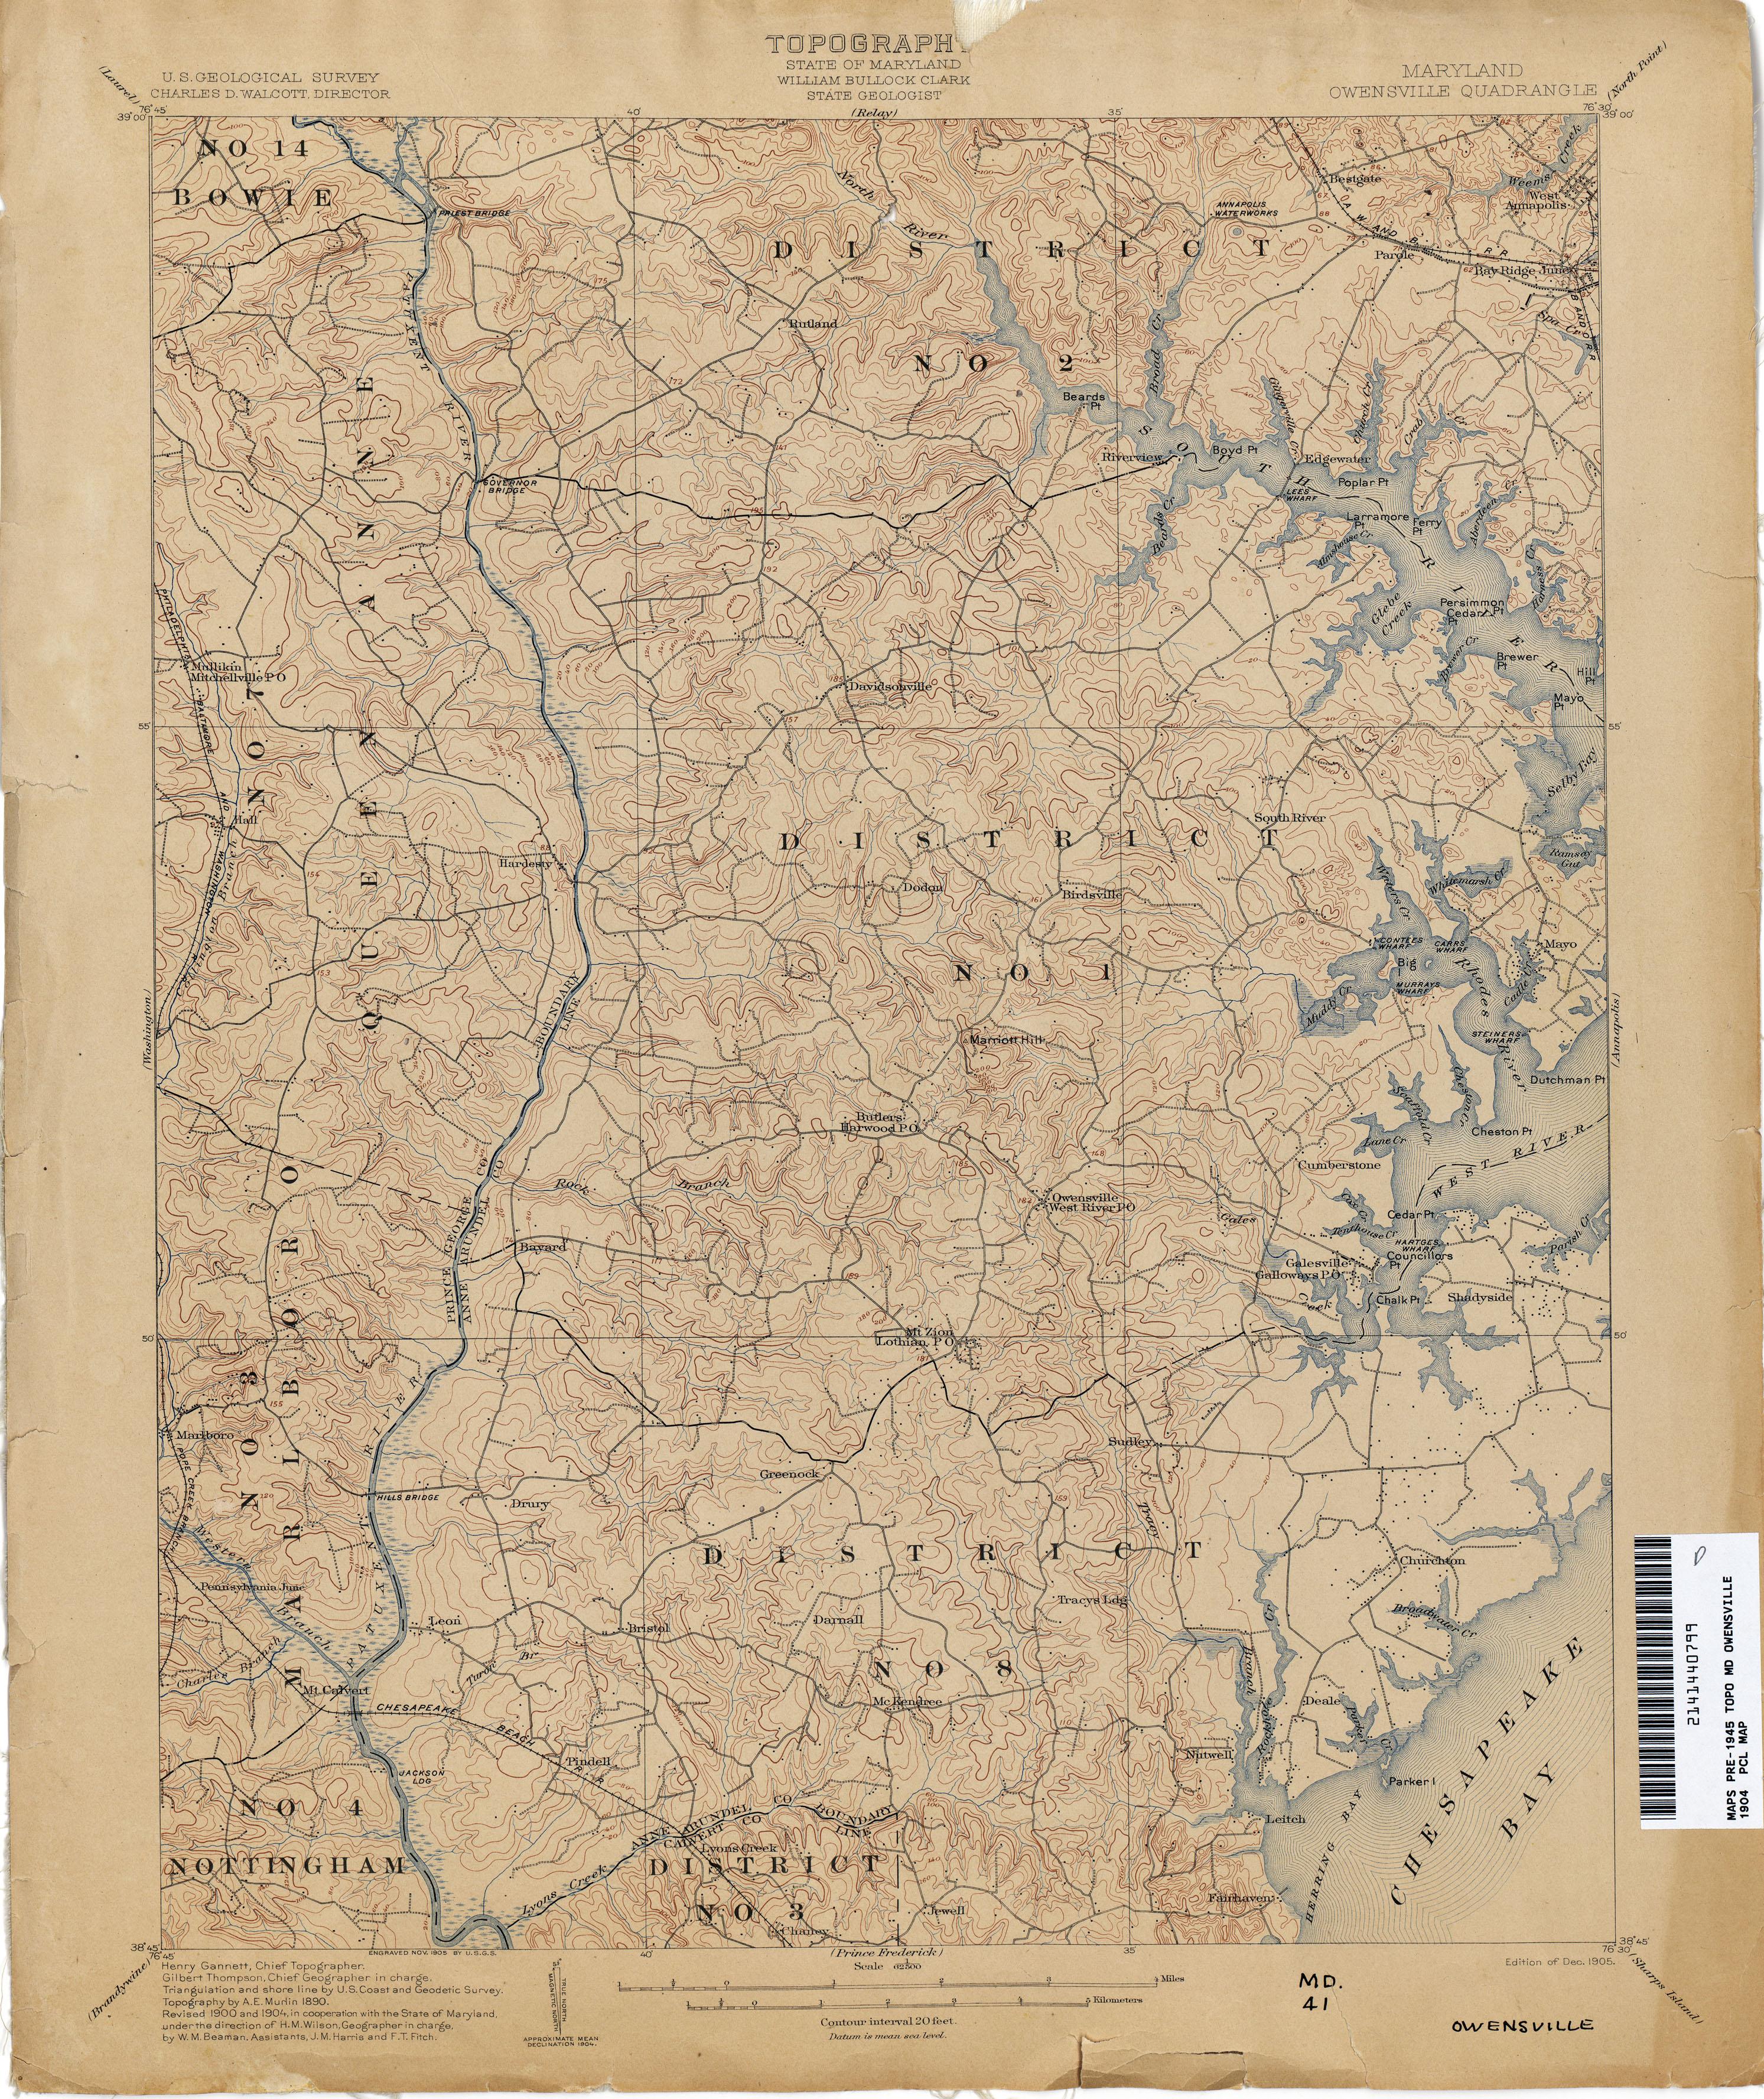 Maryland Historical Topographic Maps Maryland Historical Topographic